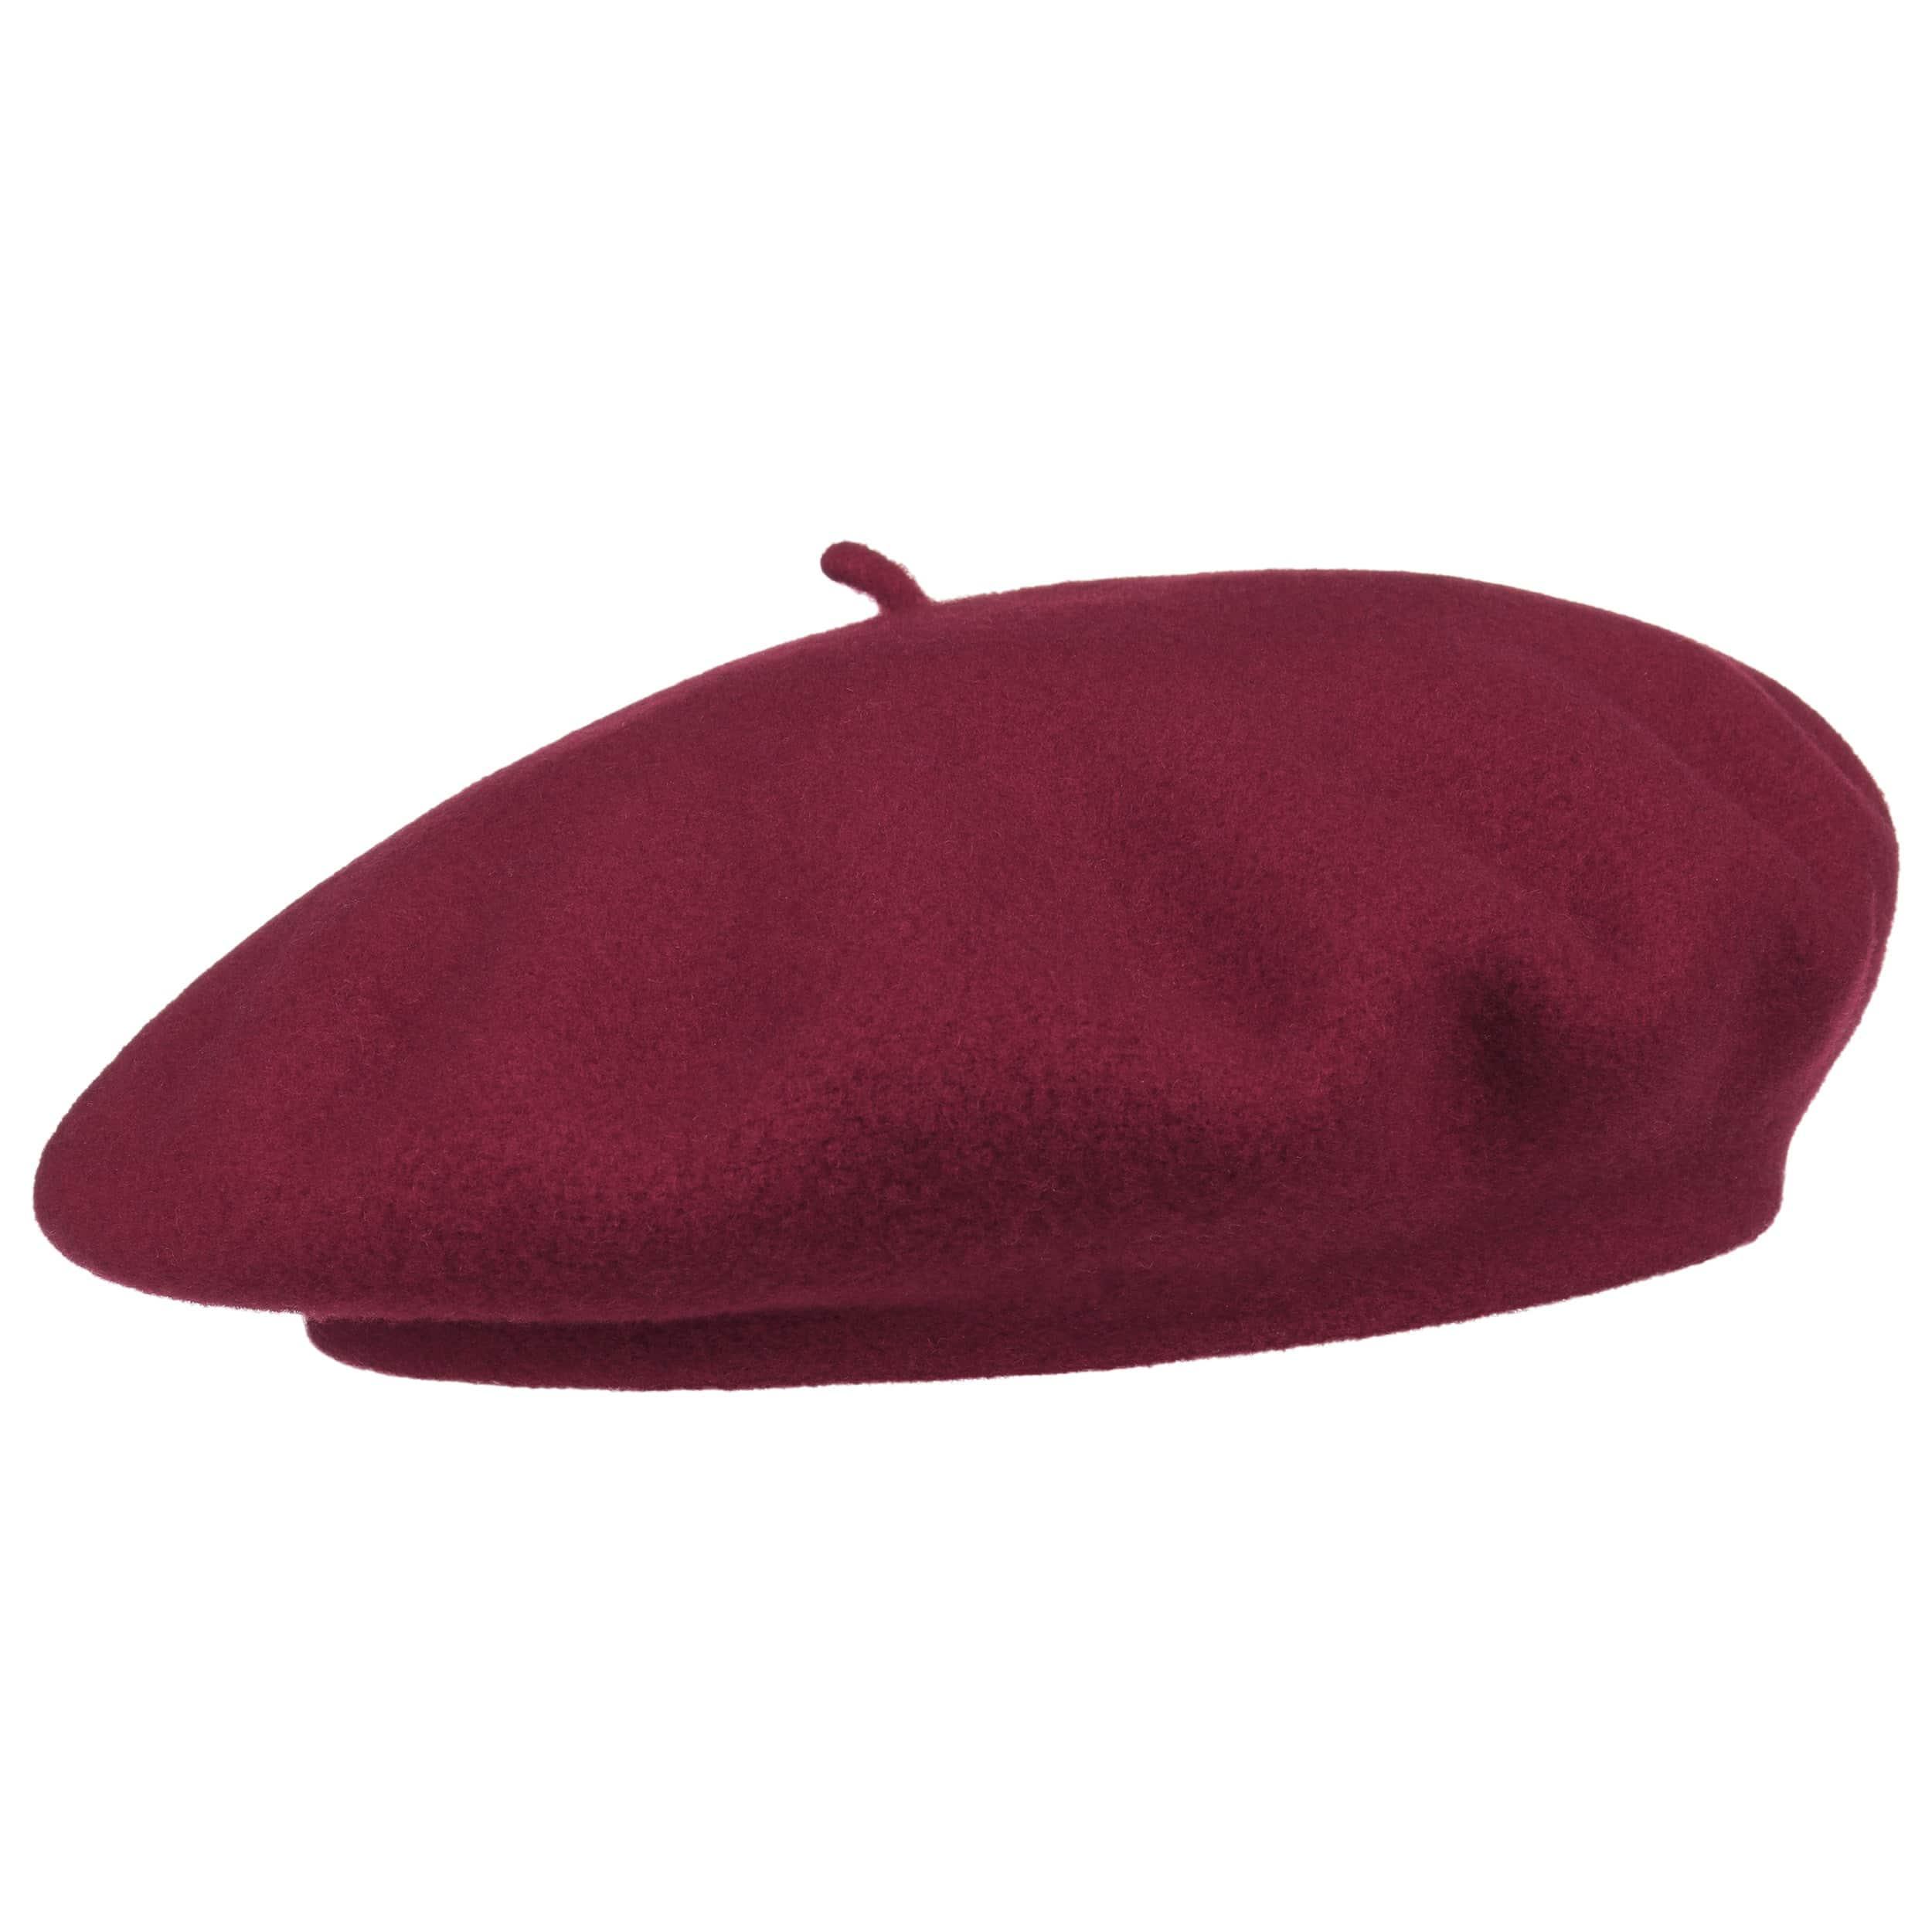 fbf31db81c3c8 Boina con Cachemira by Barascon - Gorros - sombreroshop.es